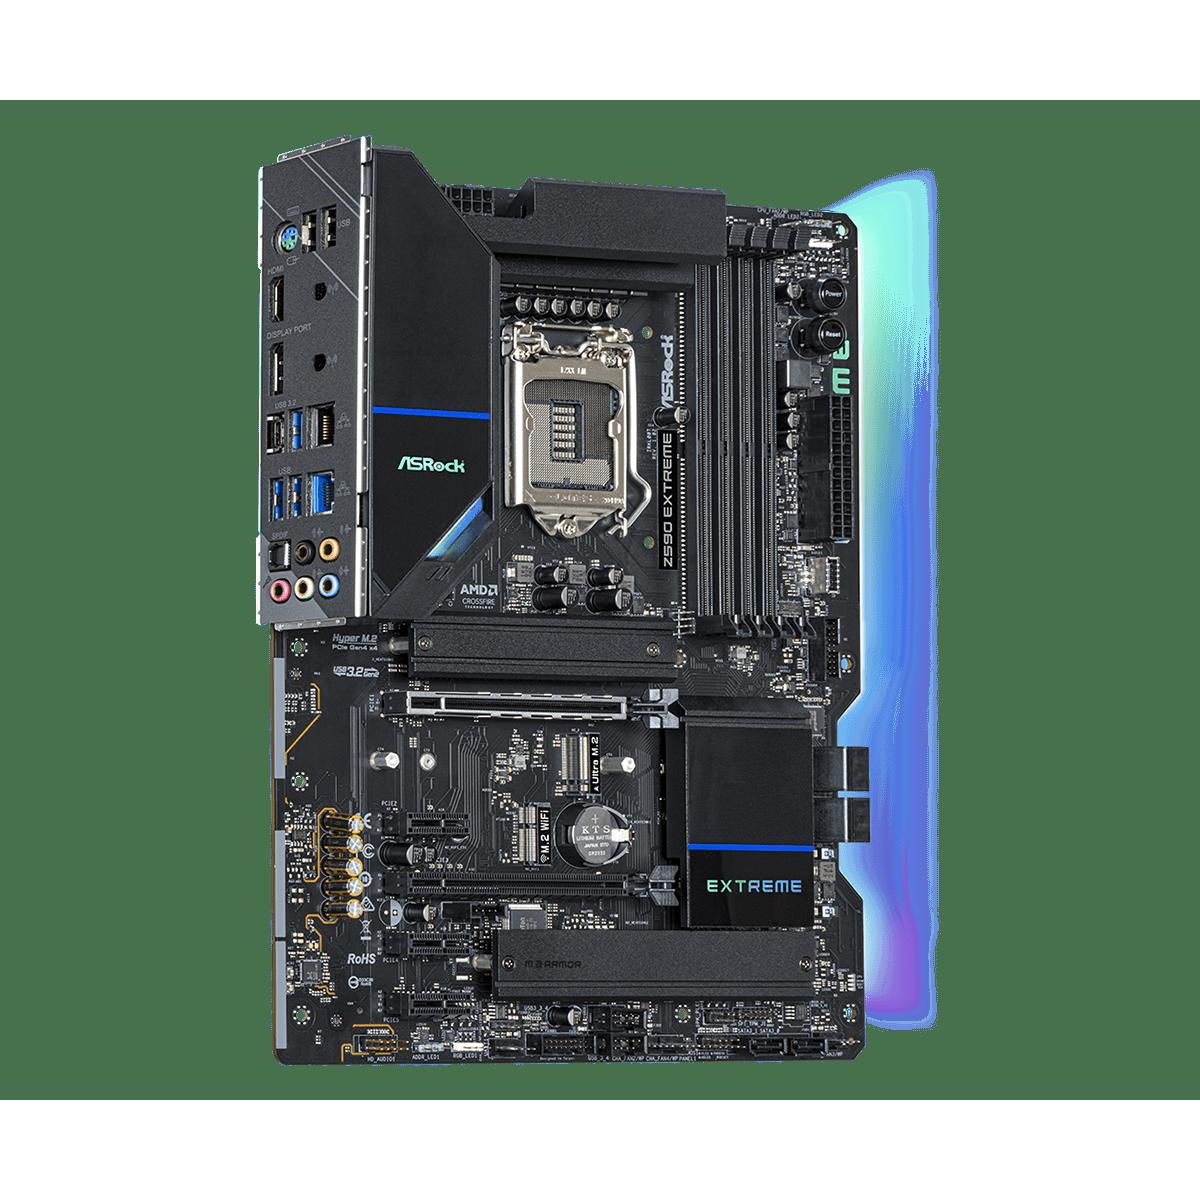 Placa Mãe ASRock Z590 Extreme, Chipset Intel Z590, Socket 1200, ATX, DDR4